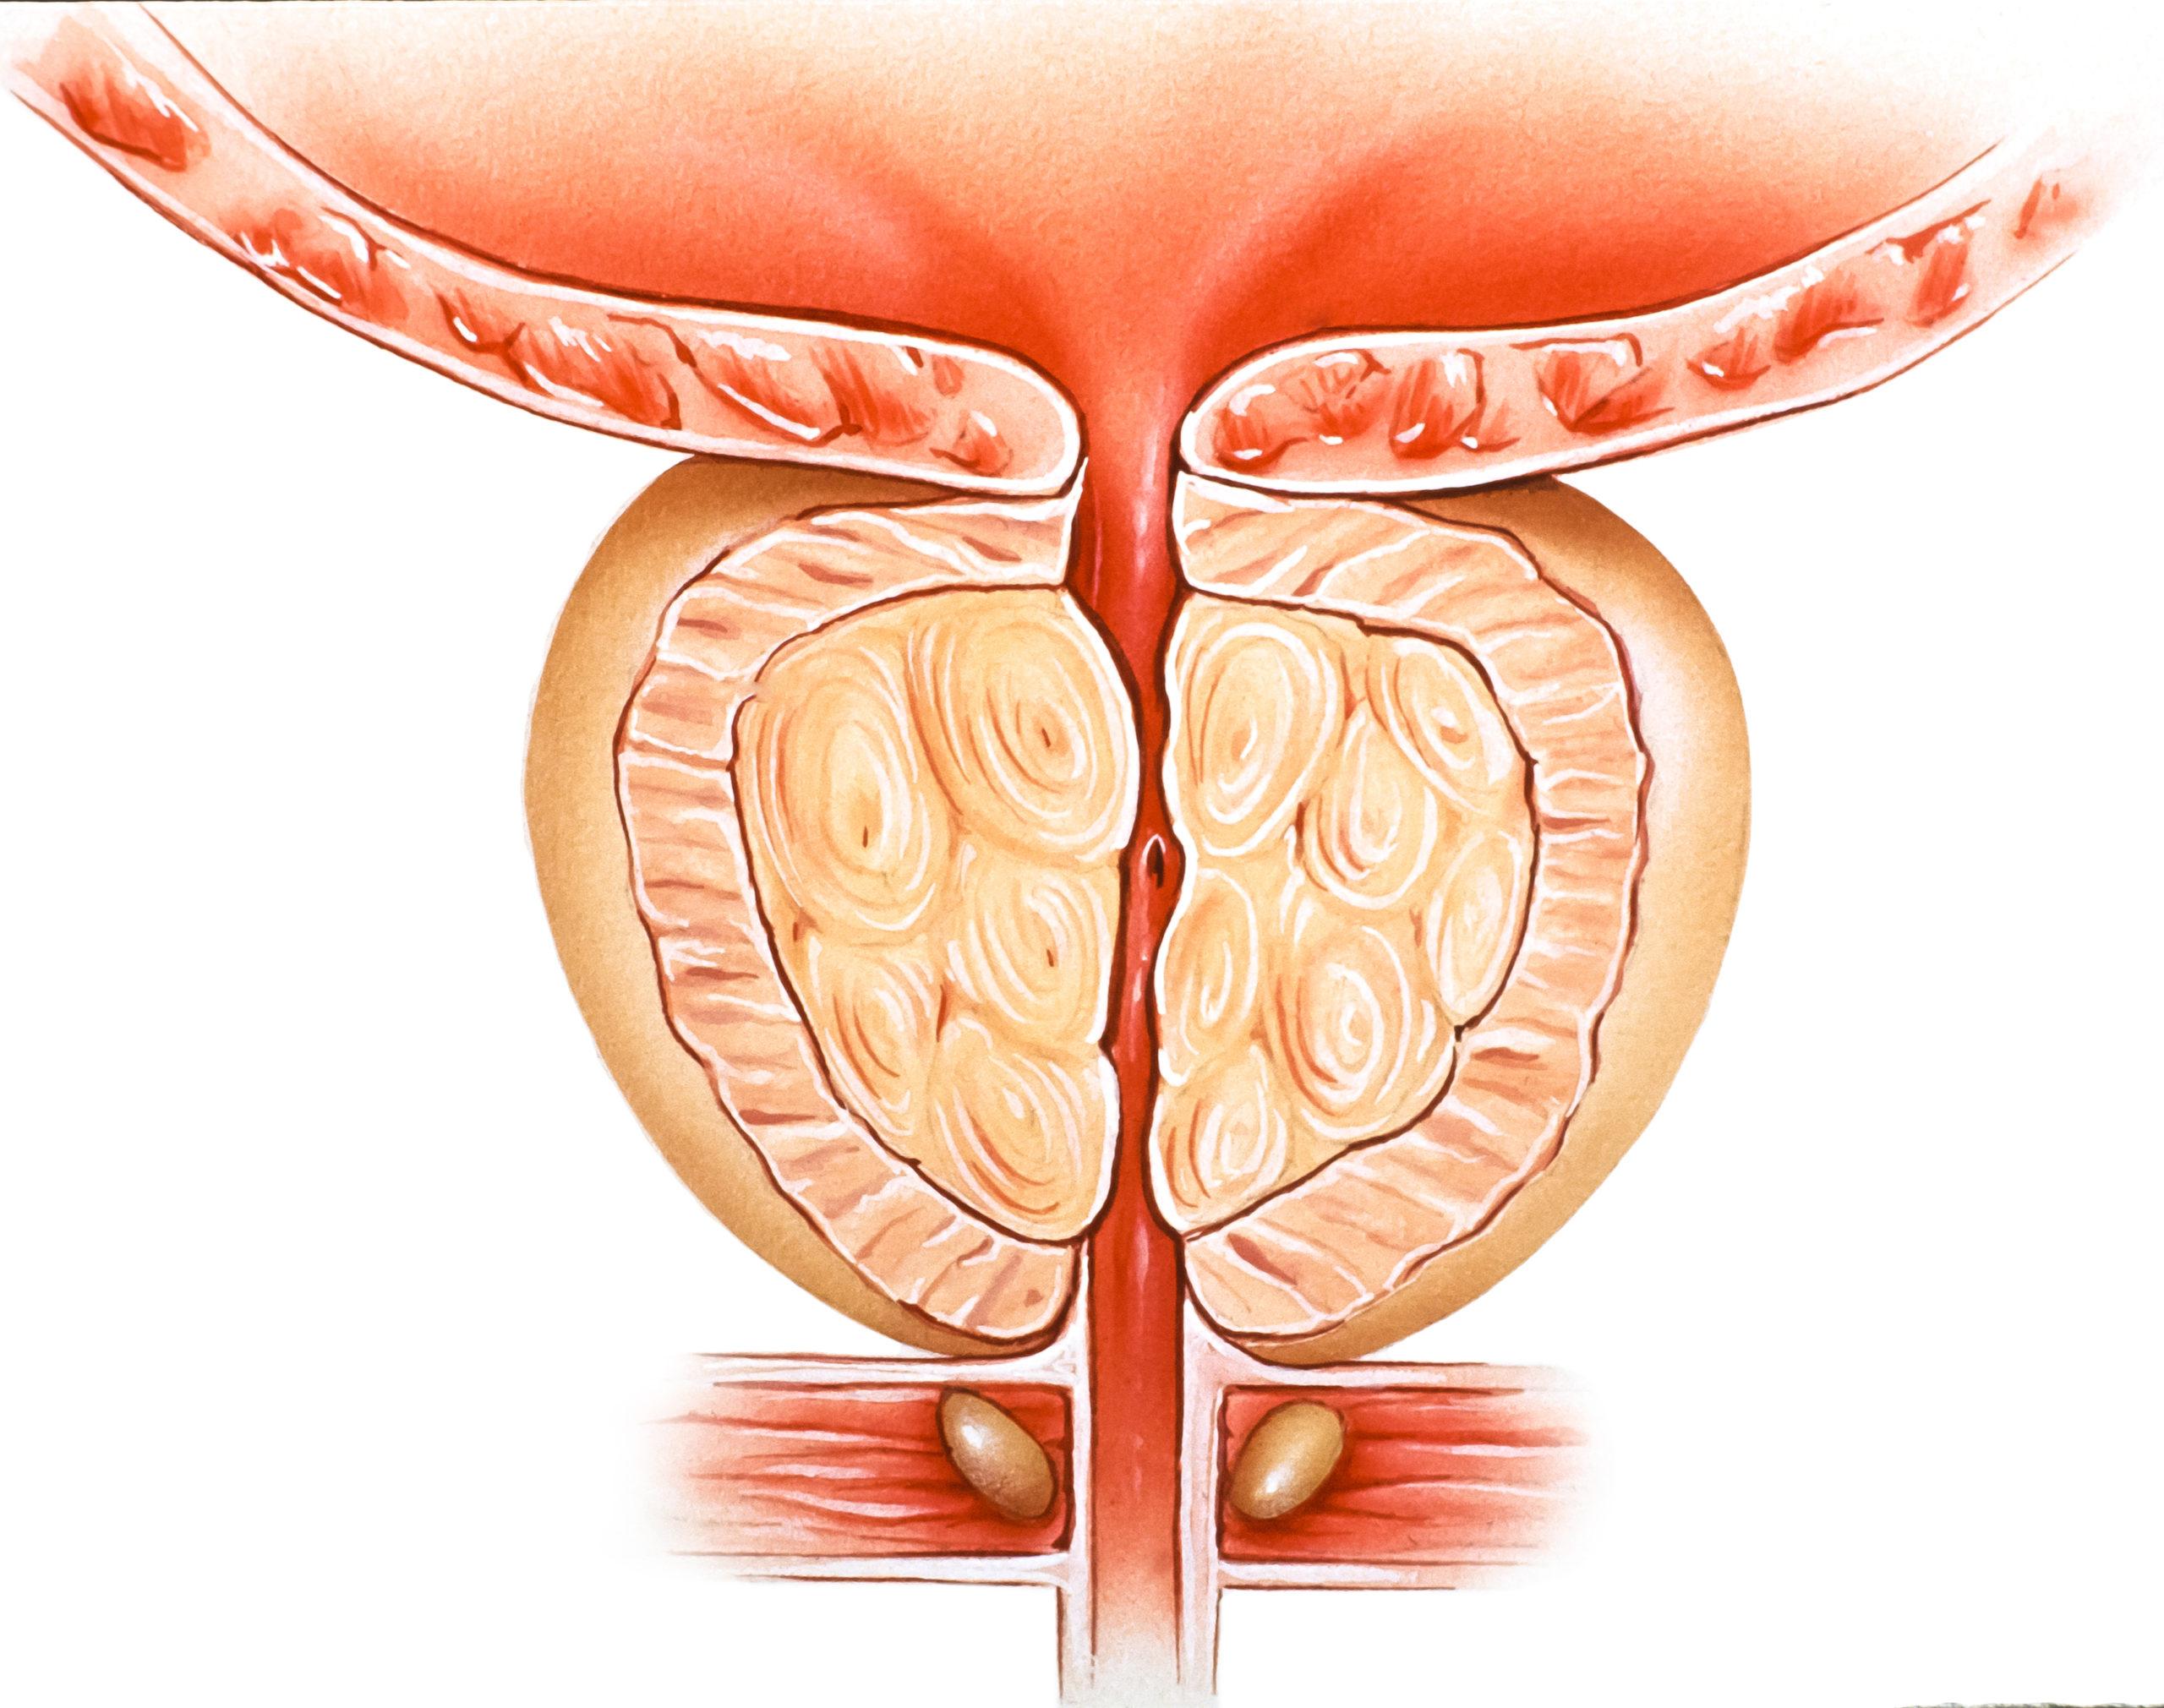 A diagram of Benign Prostatic Hyperplasia